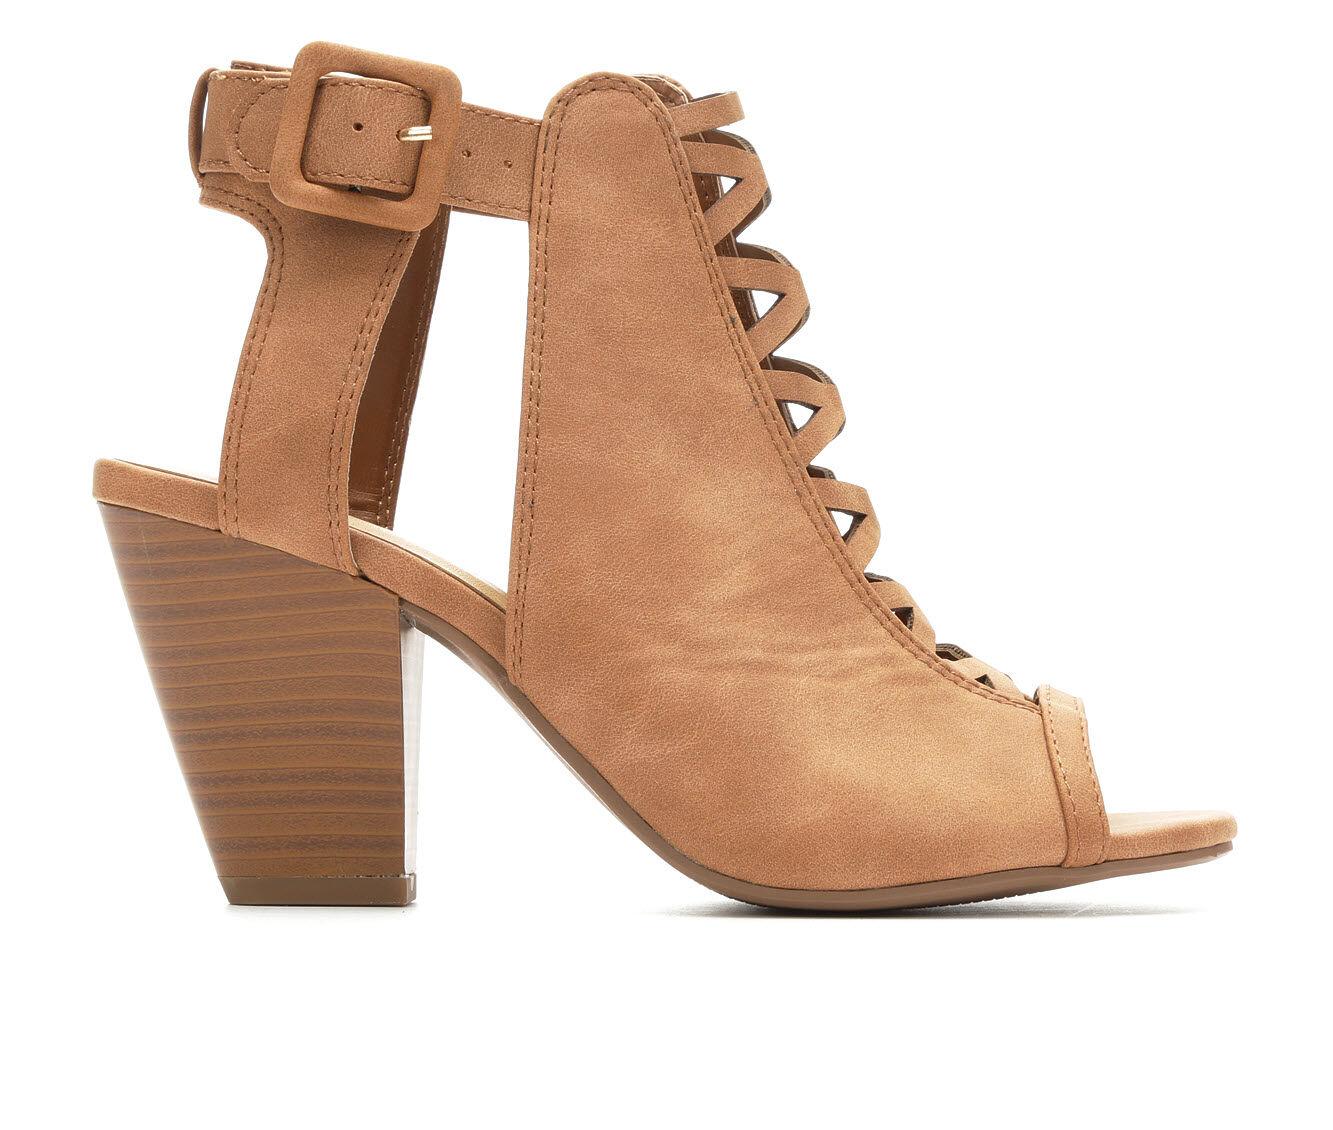 Women's Y-Not Lacet Heeled Sandals Tan